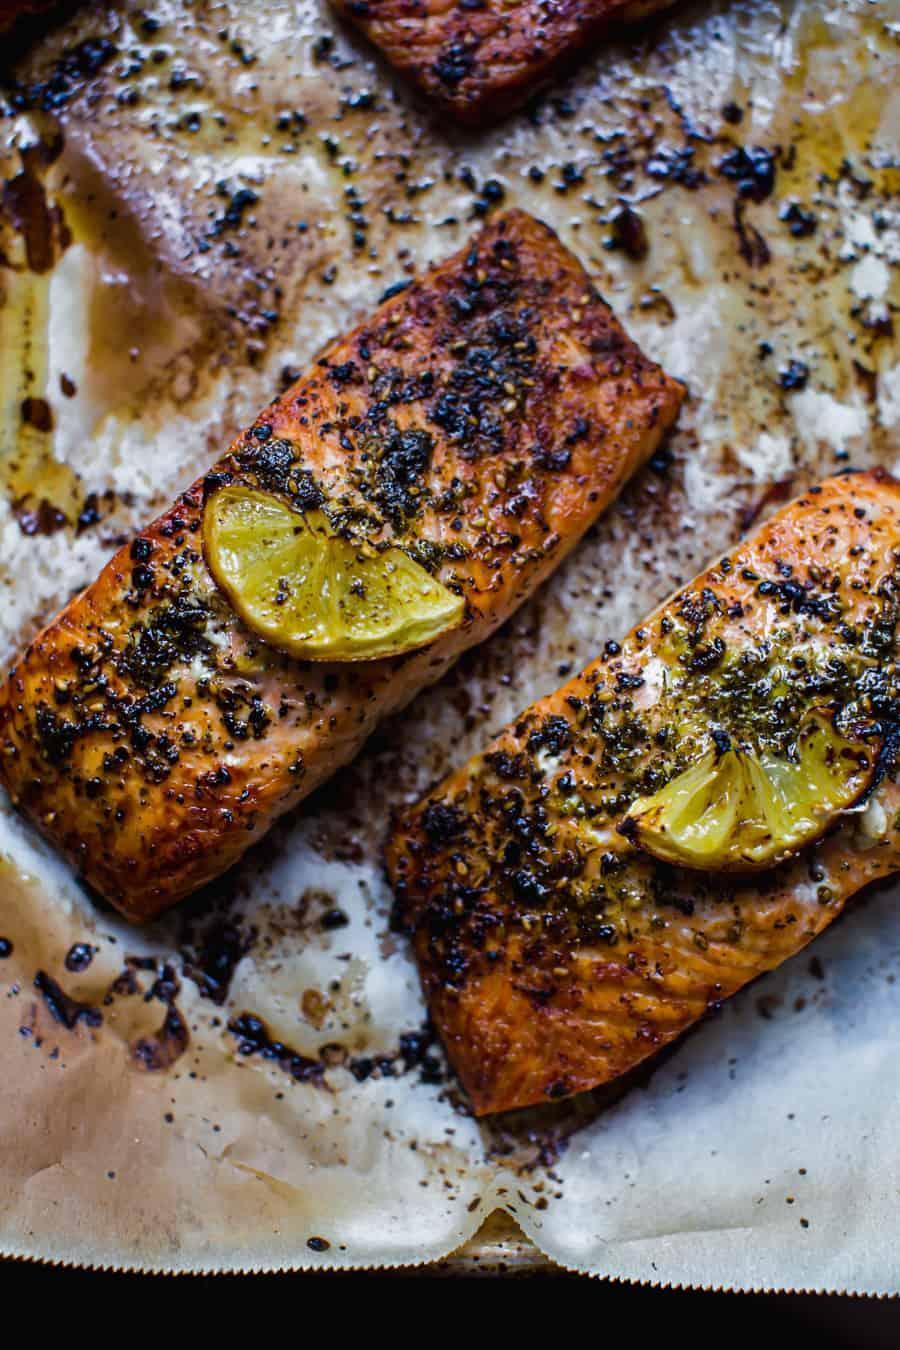 roasted salmon with Za'atar and sumac